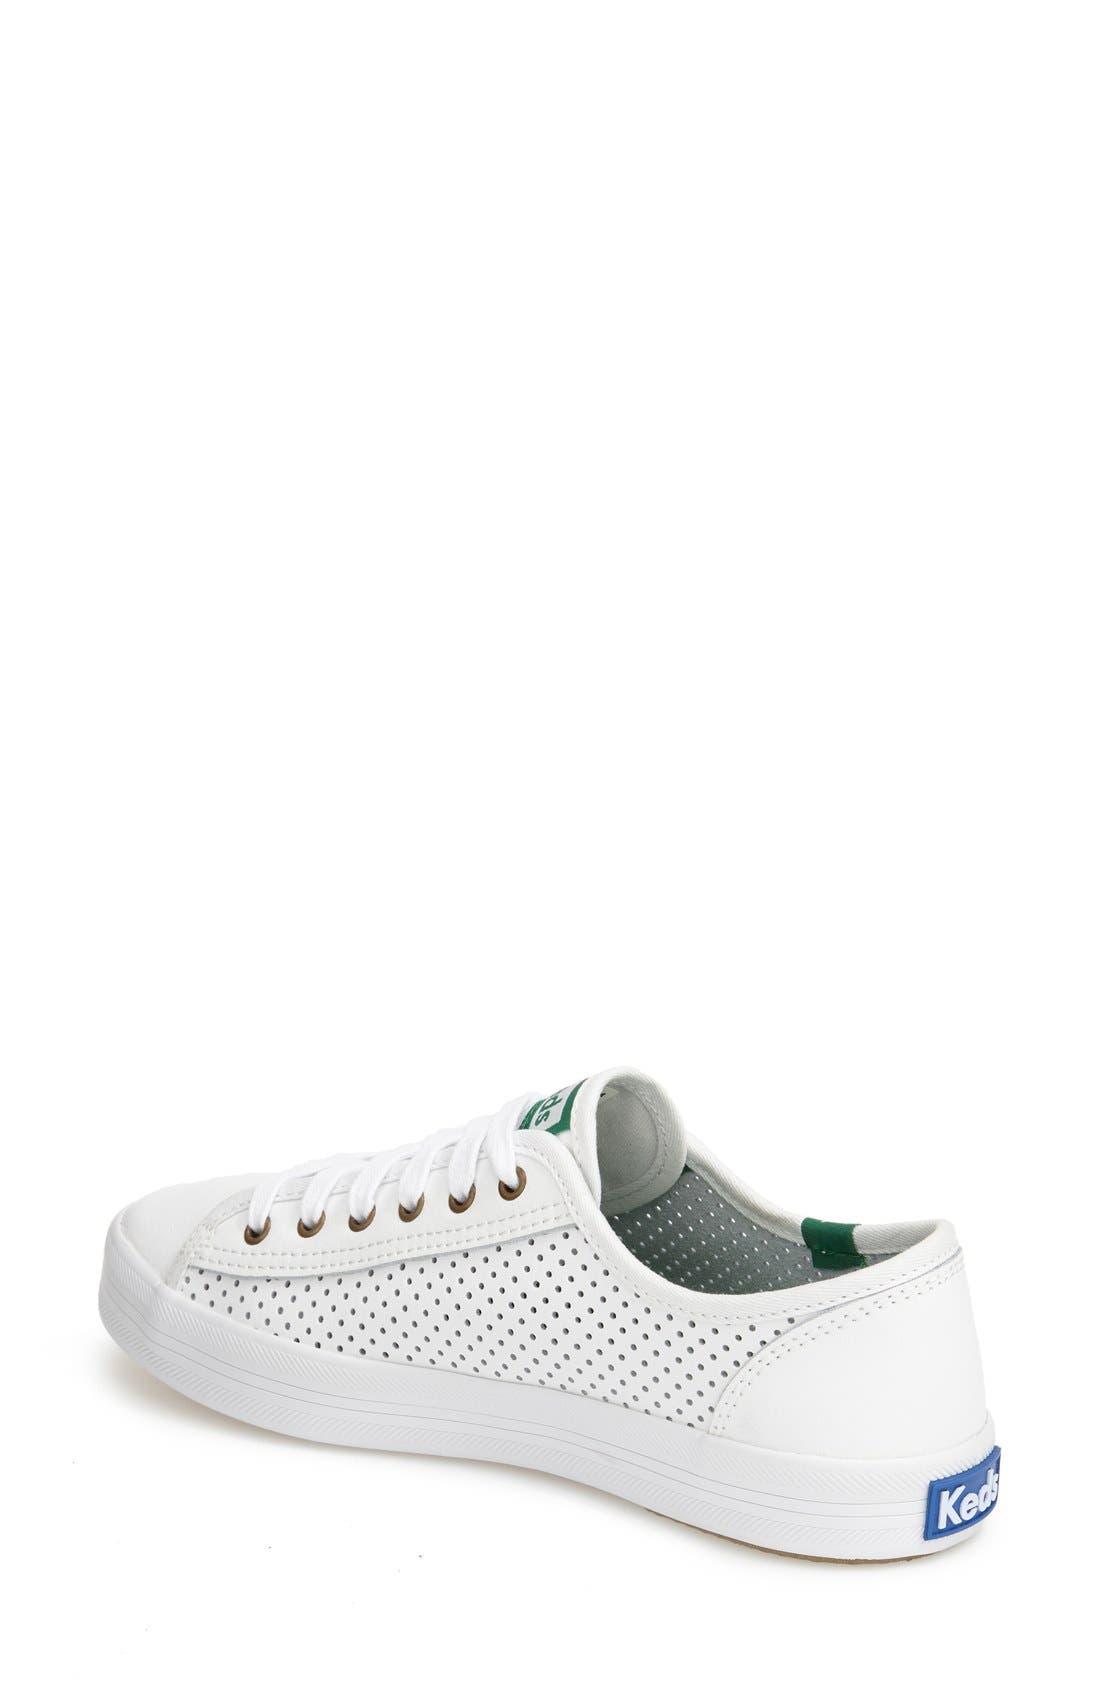 KEDS<SUP>®</SUP>,                             'Kickstart' Perforated Sneaker,                             Alternate thumbnail 2, color,                             100